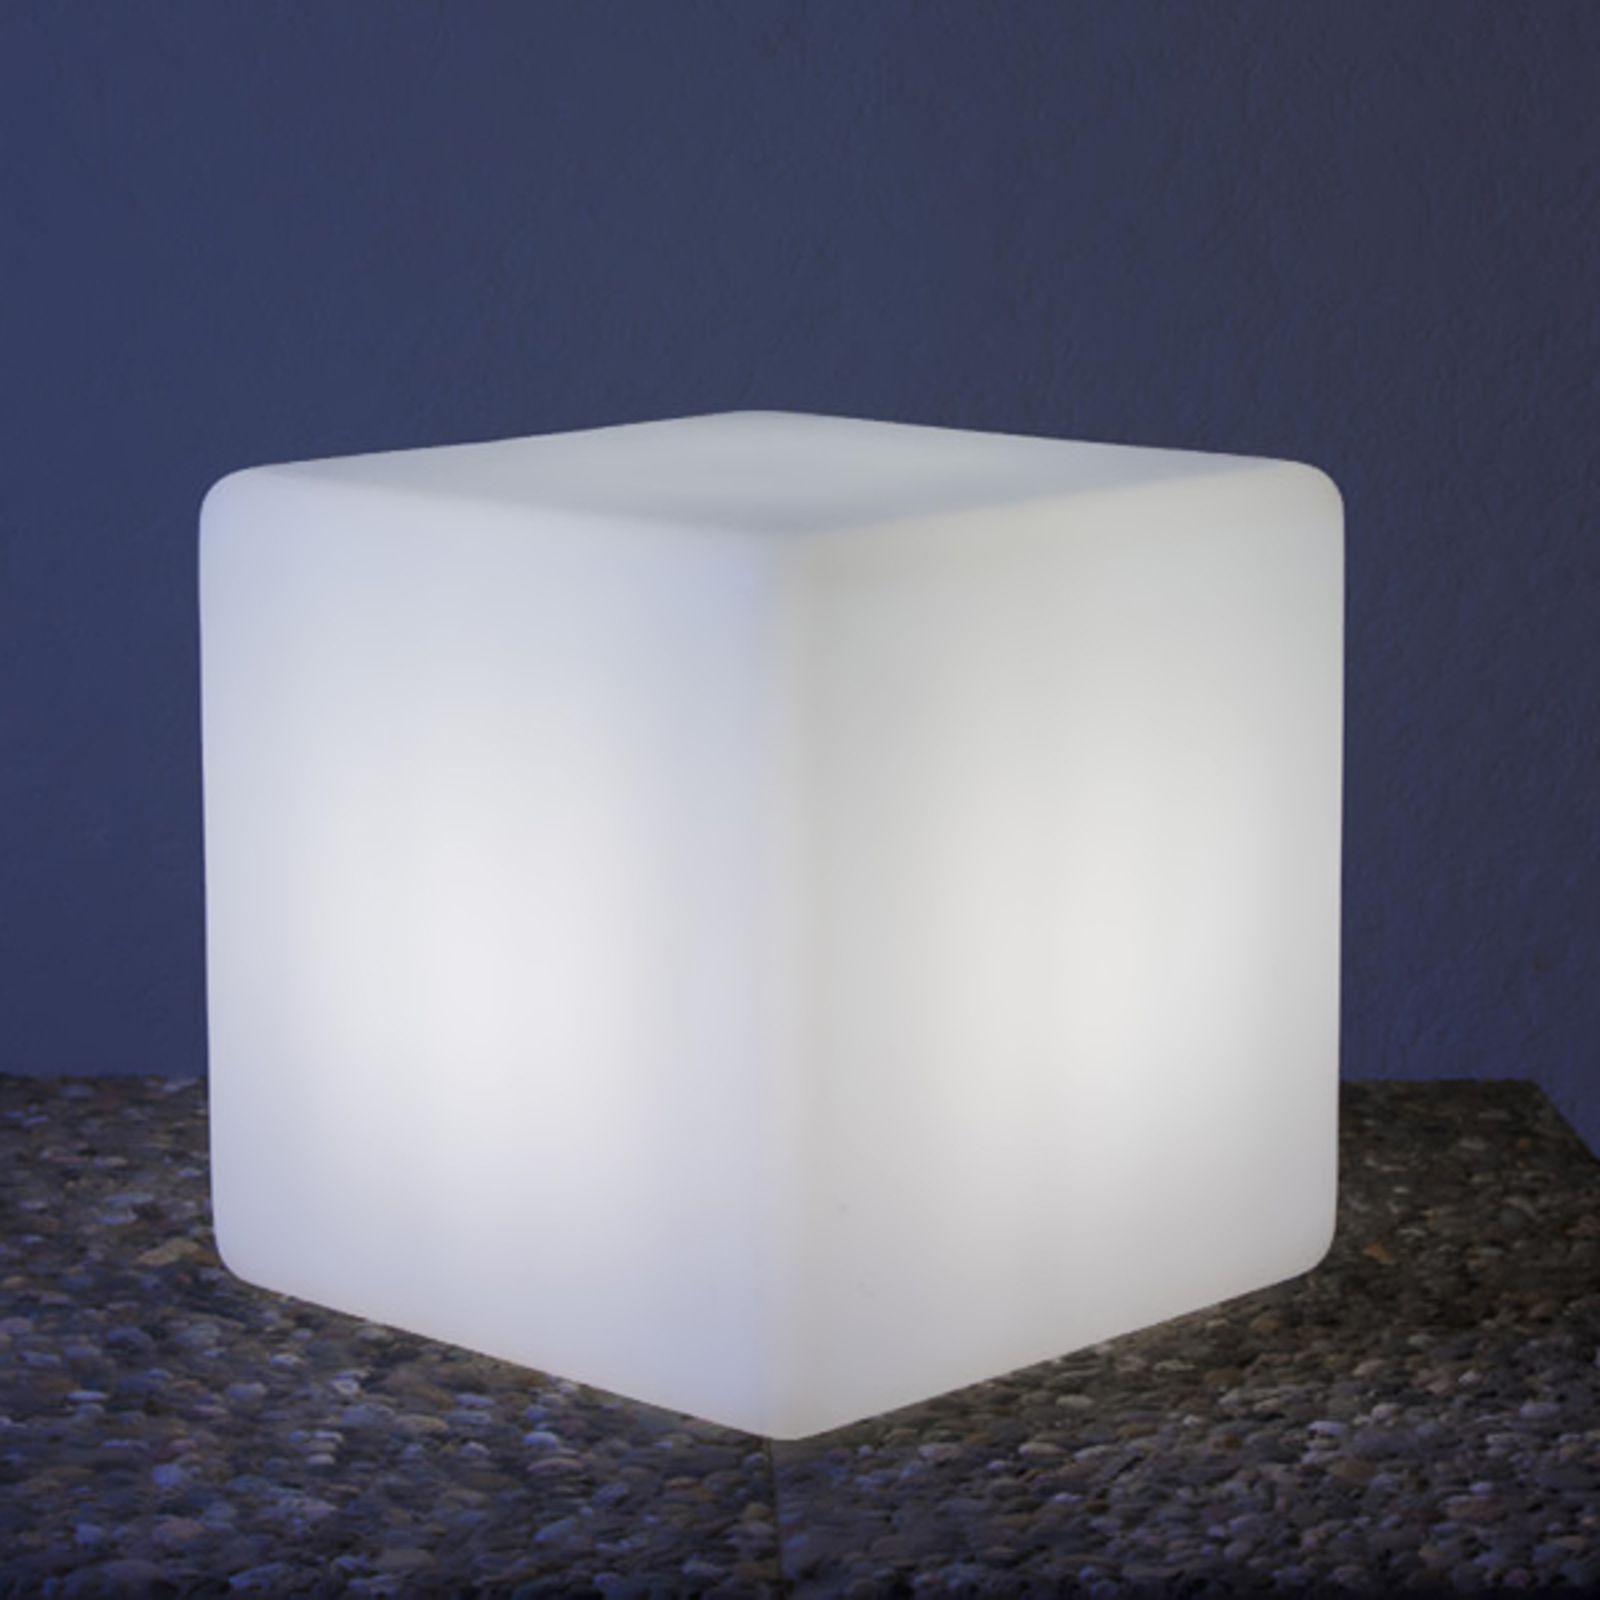 Cube terningelampe i høj kvalitet, 35 cm